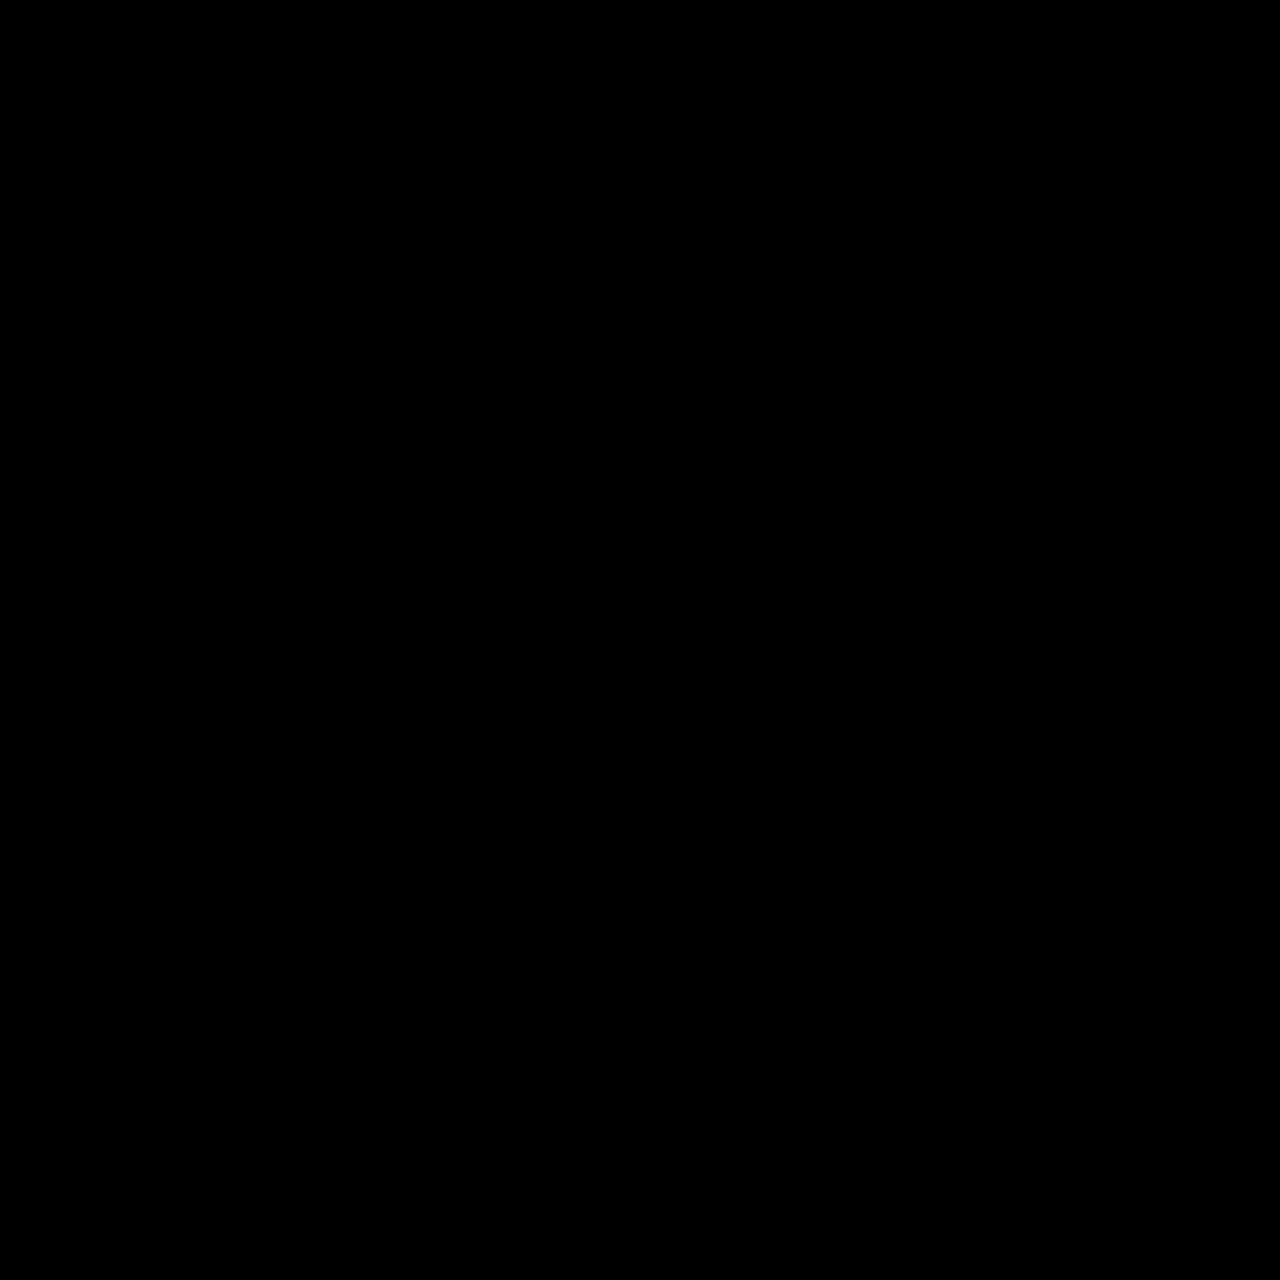 L'Oréal Saudi Arabia